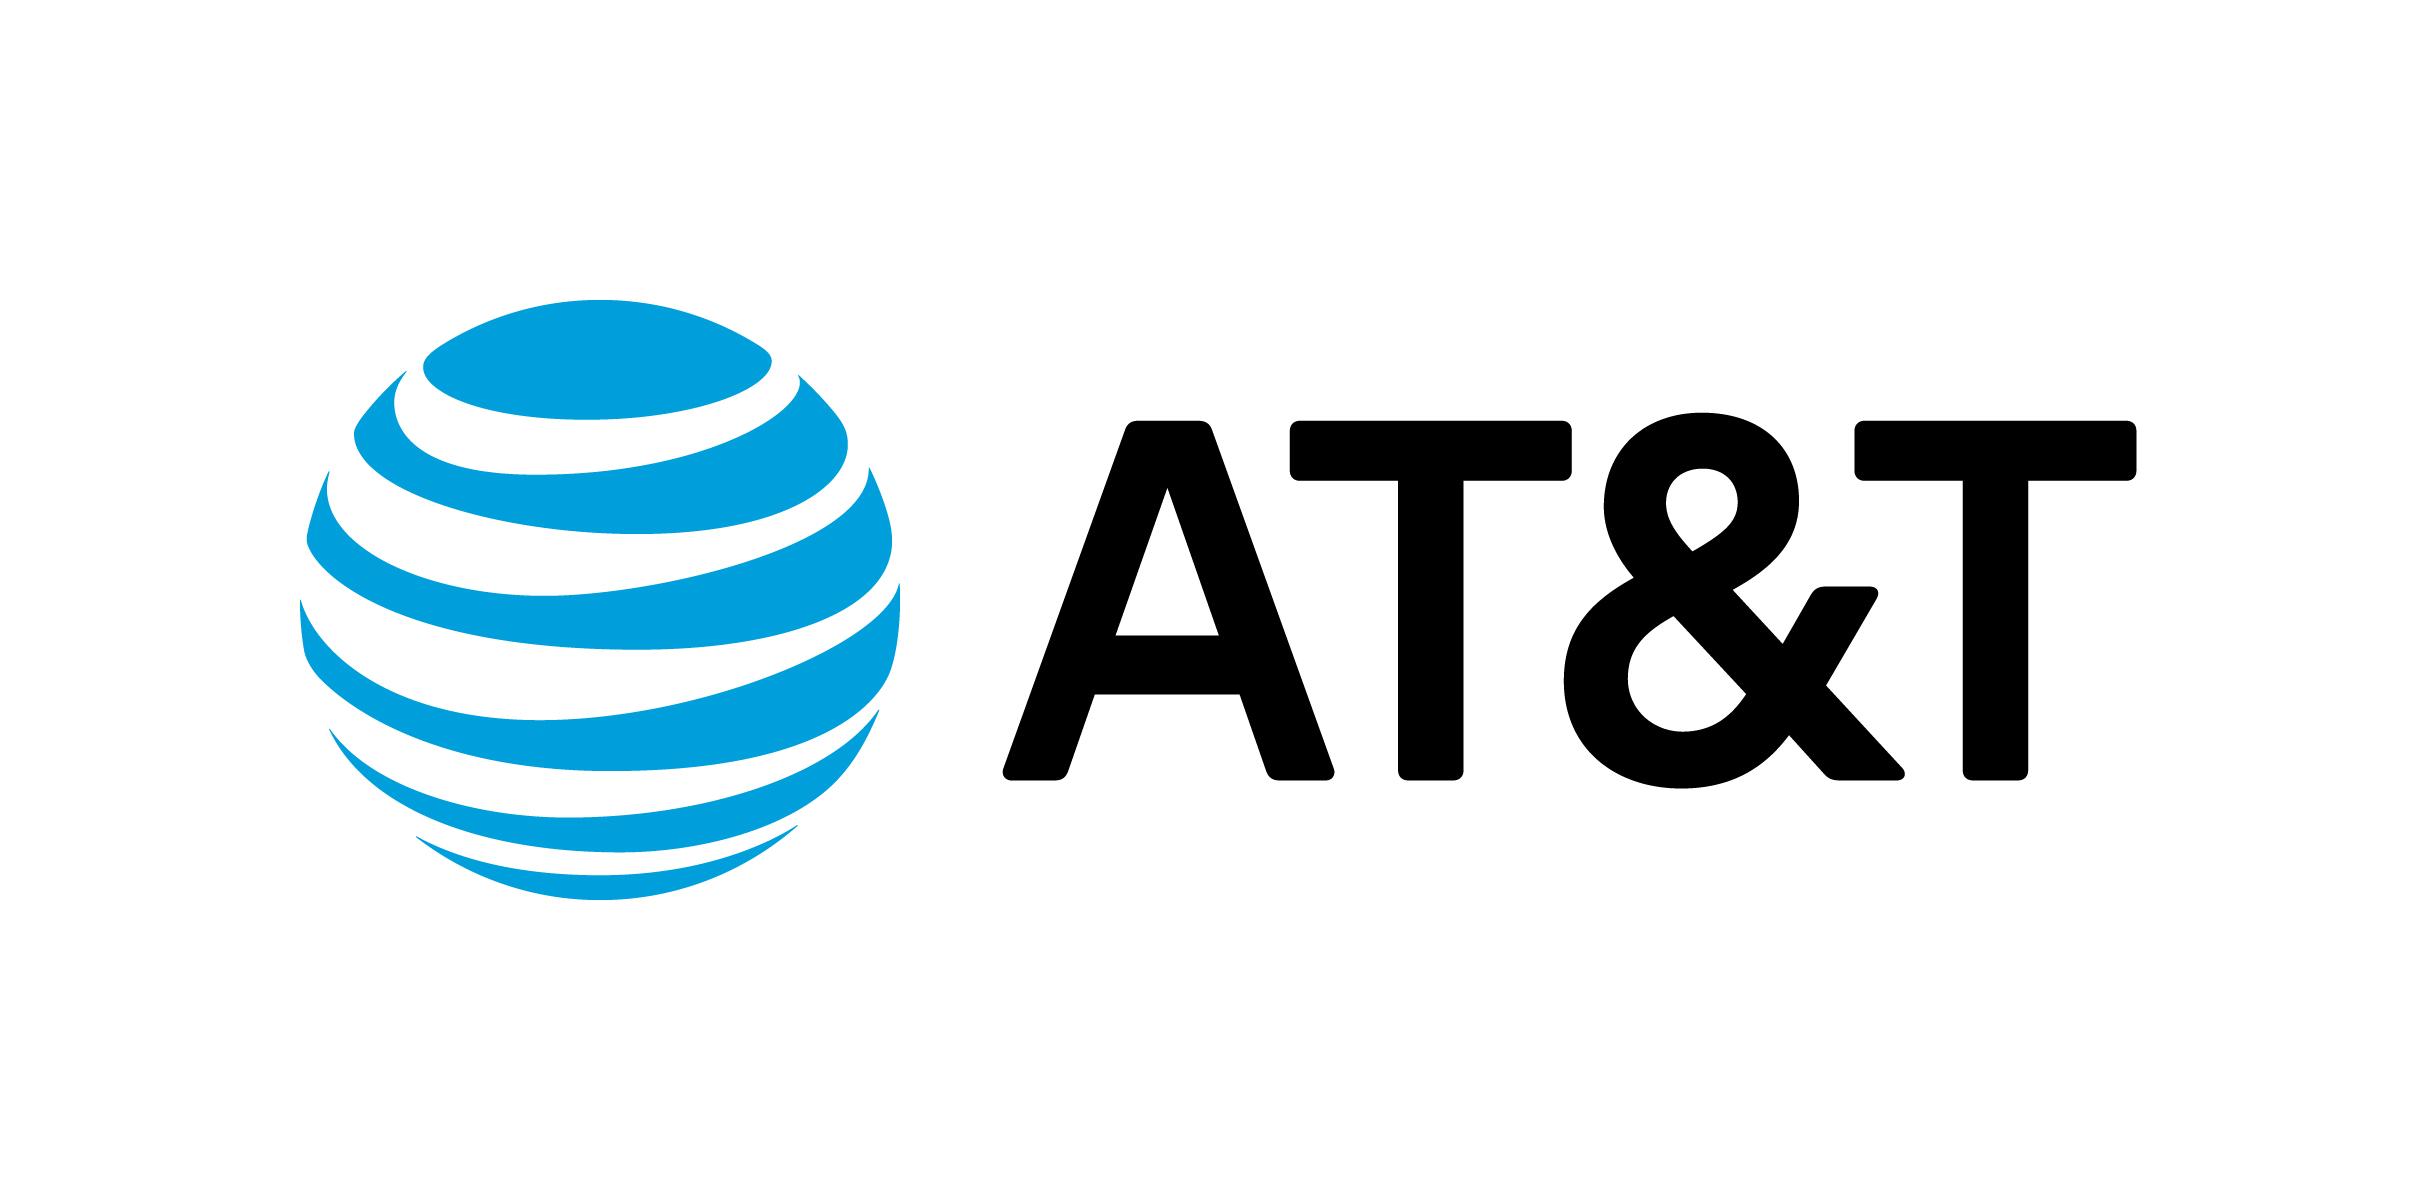 Hole - AT&T - Logo